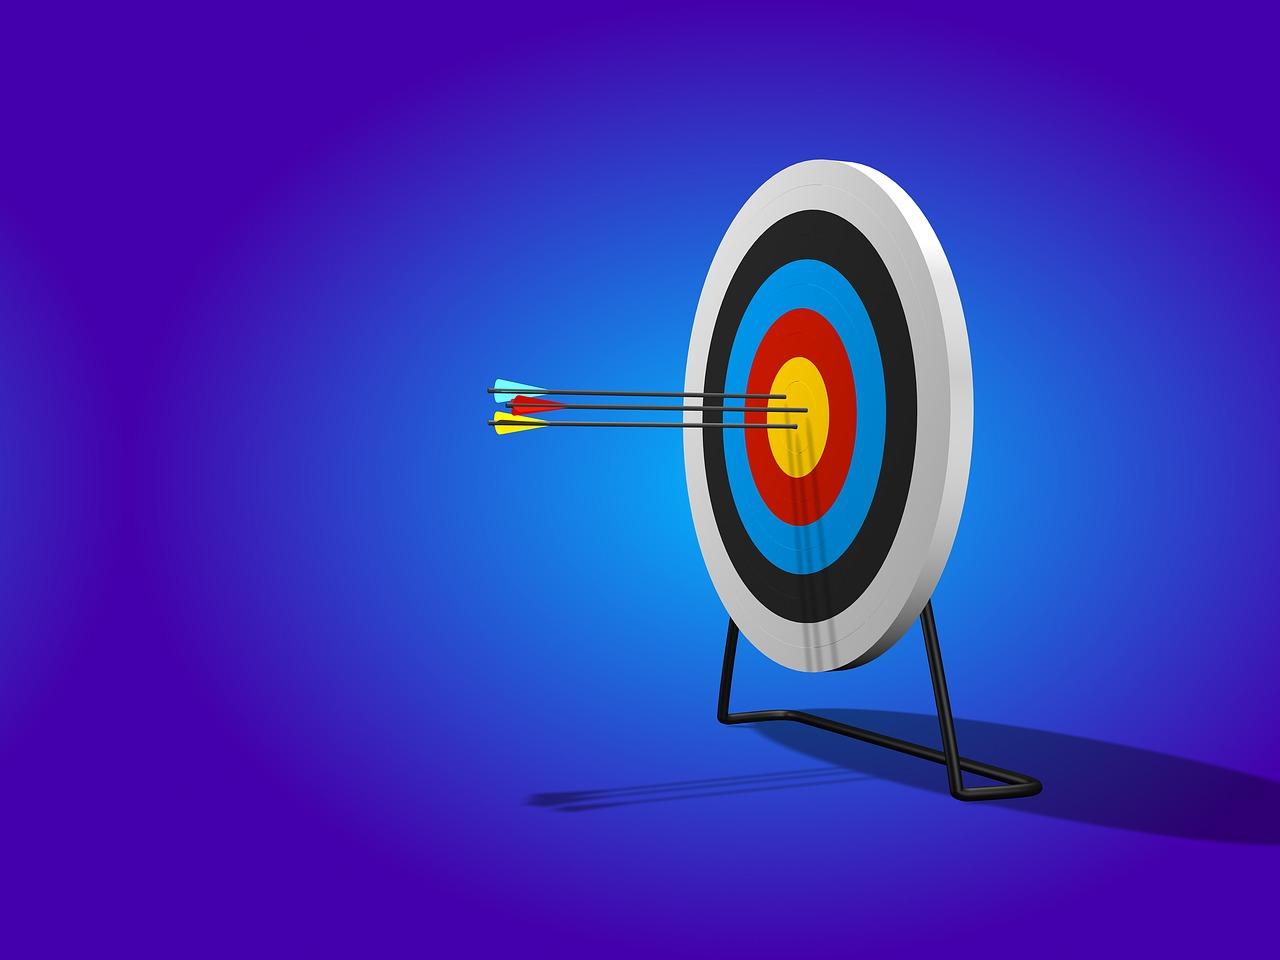 Dart - Symbolize Goals